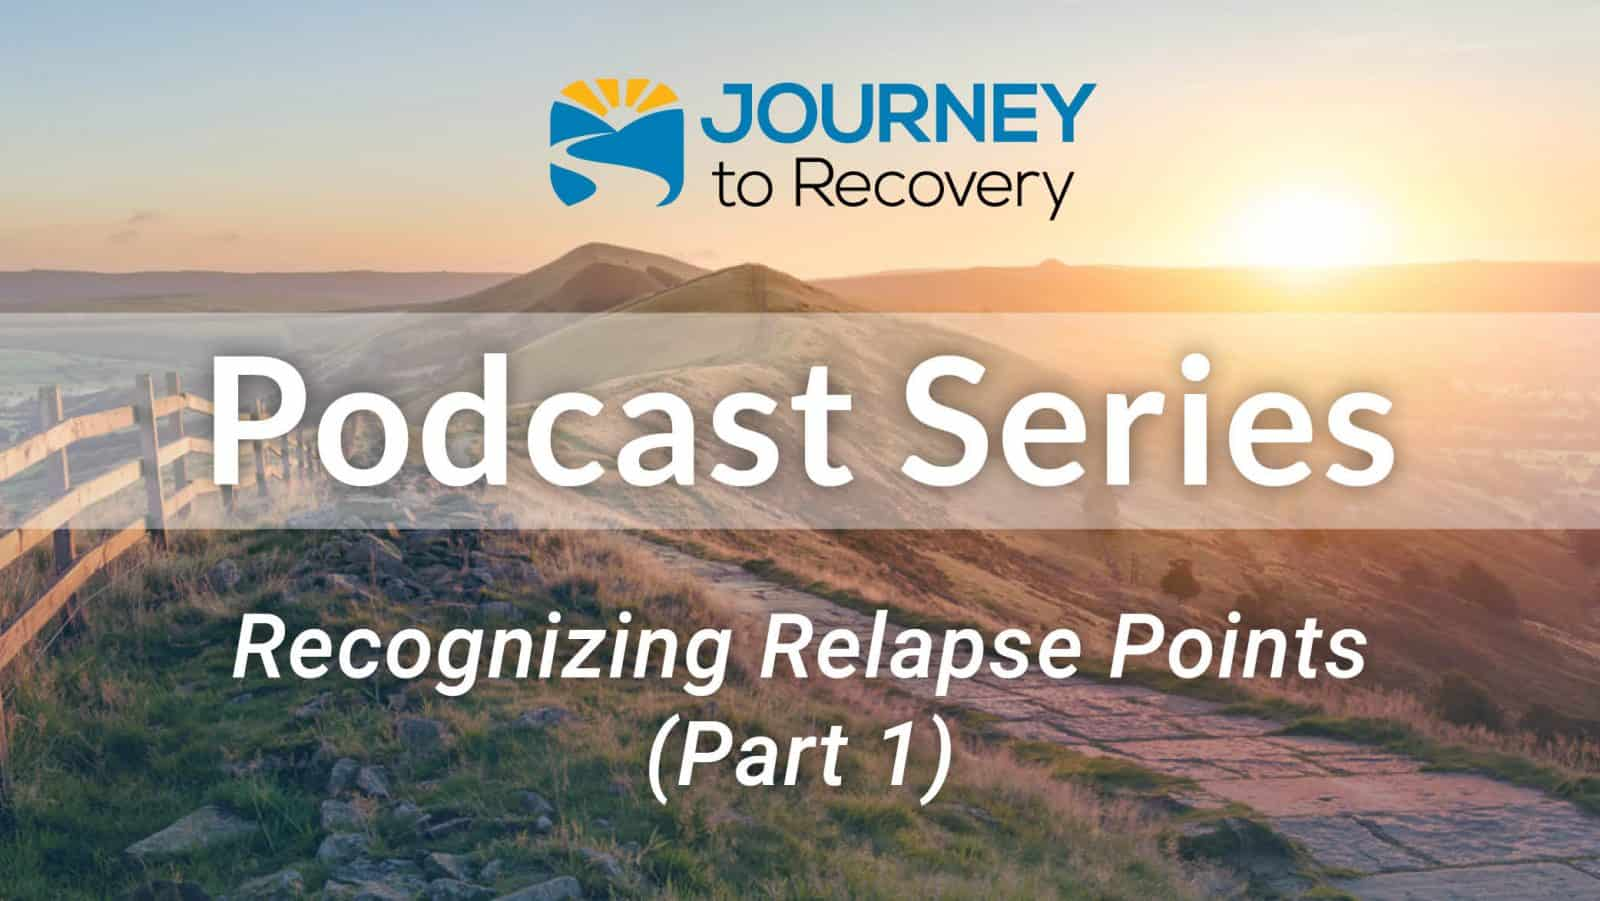 Recognizing Relapse Points (Part 1)